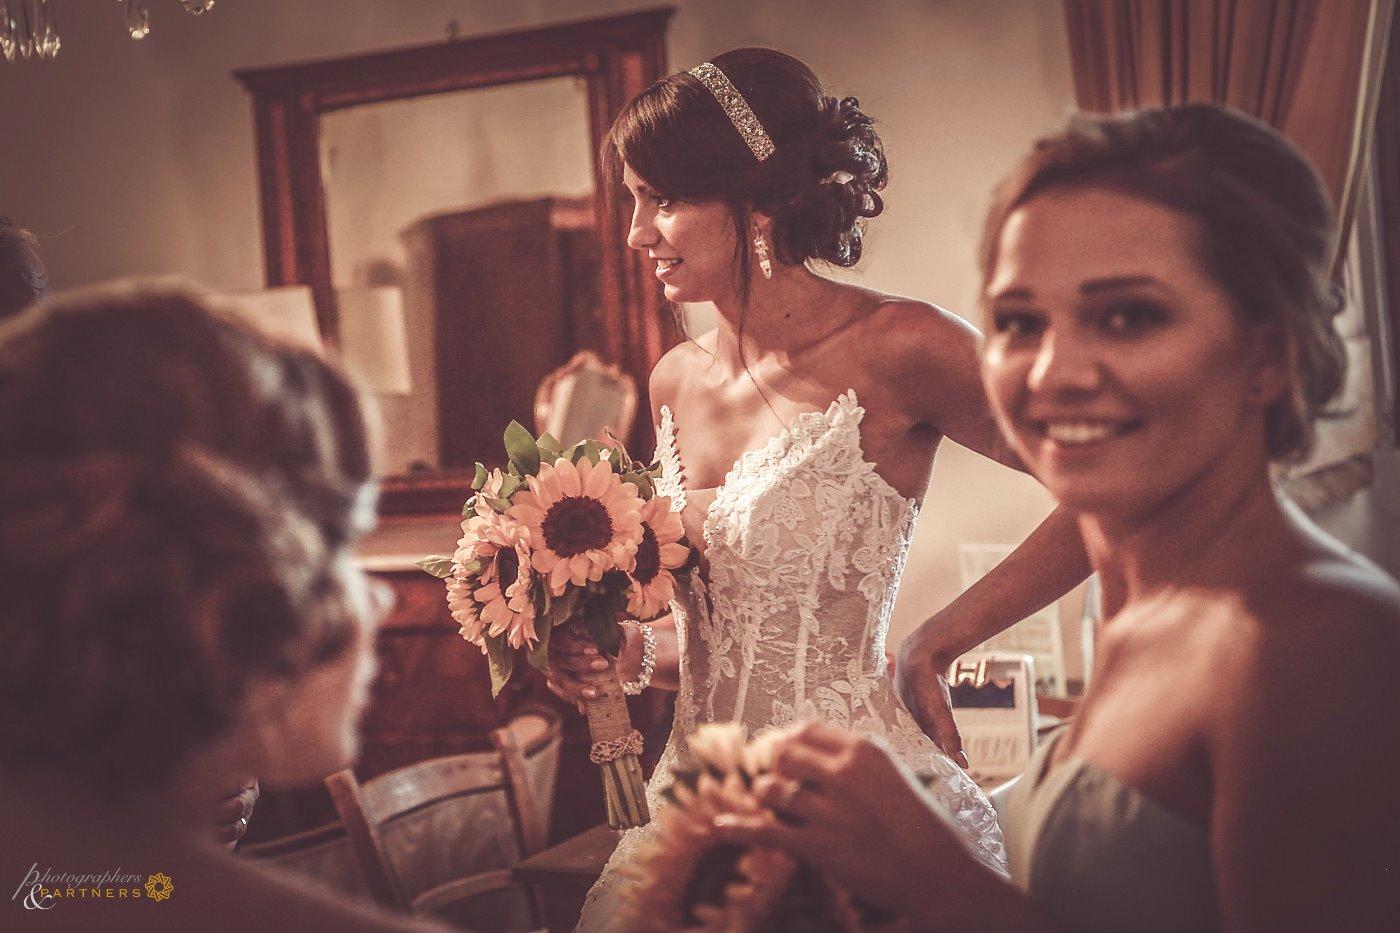 photography_weddings_vicchiomaggio_07.jpg